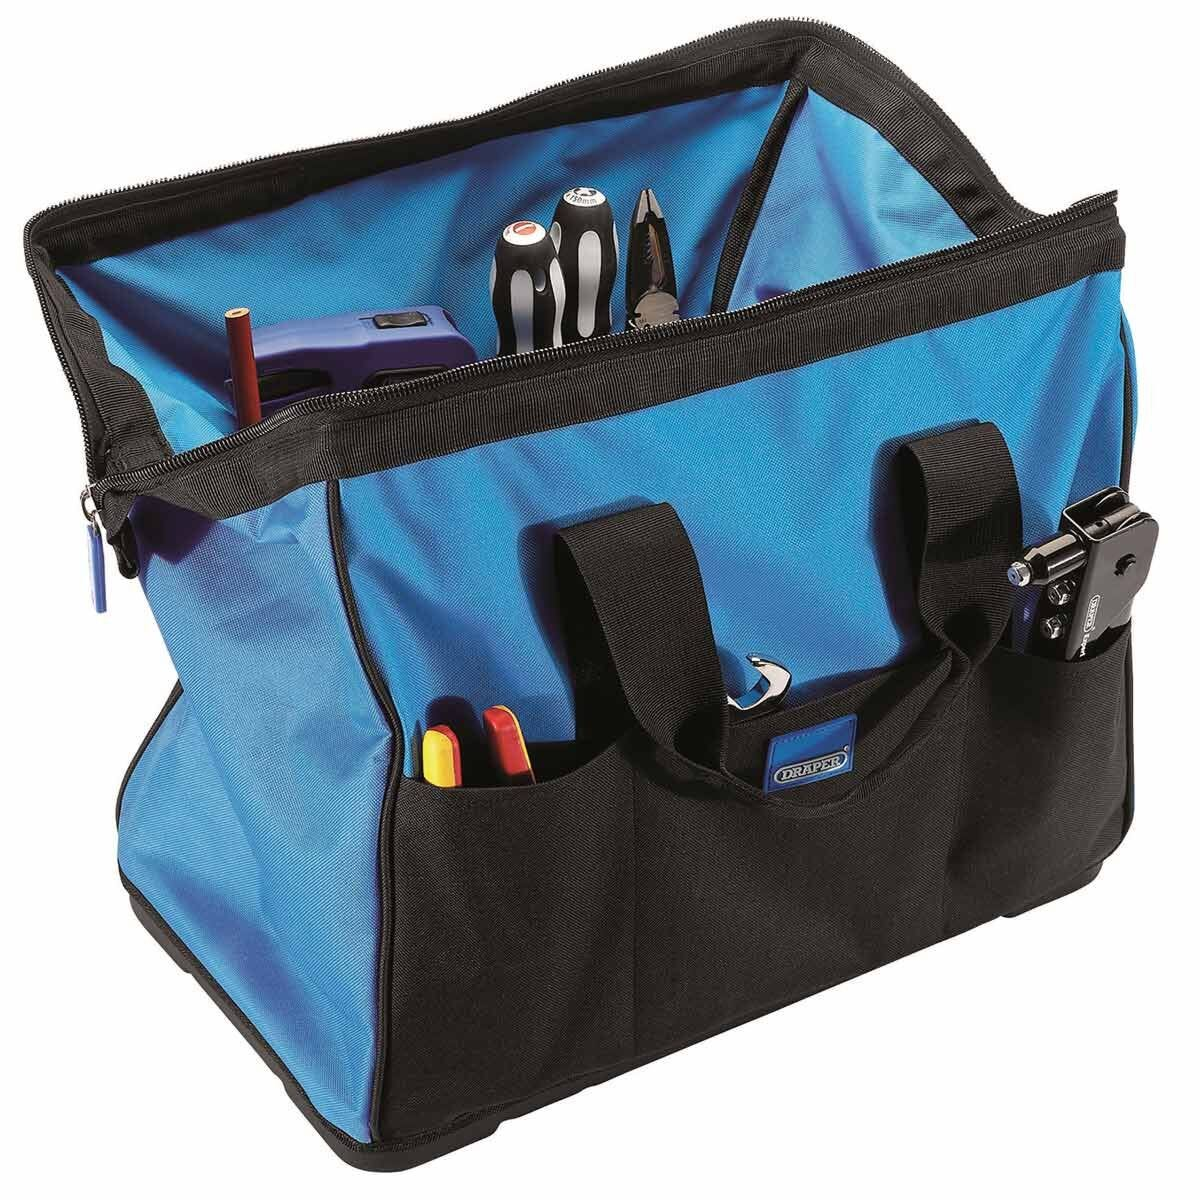 Draper 440mm Open Mouth Tool Bag